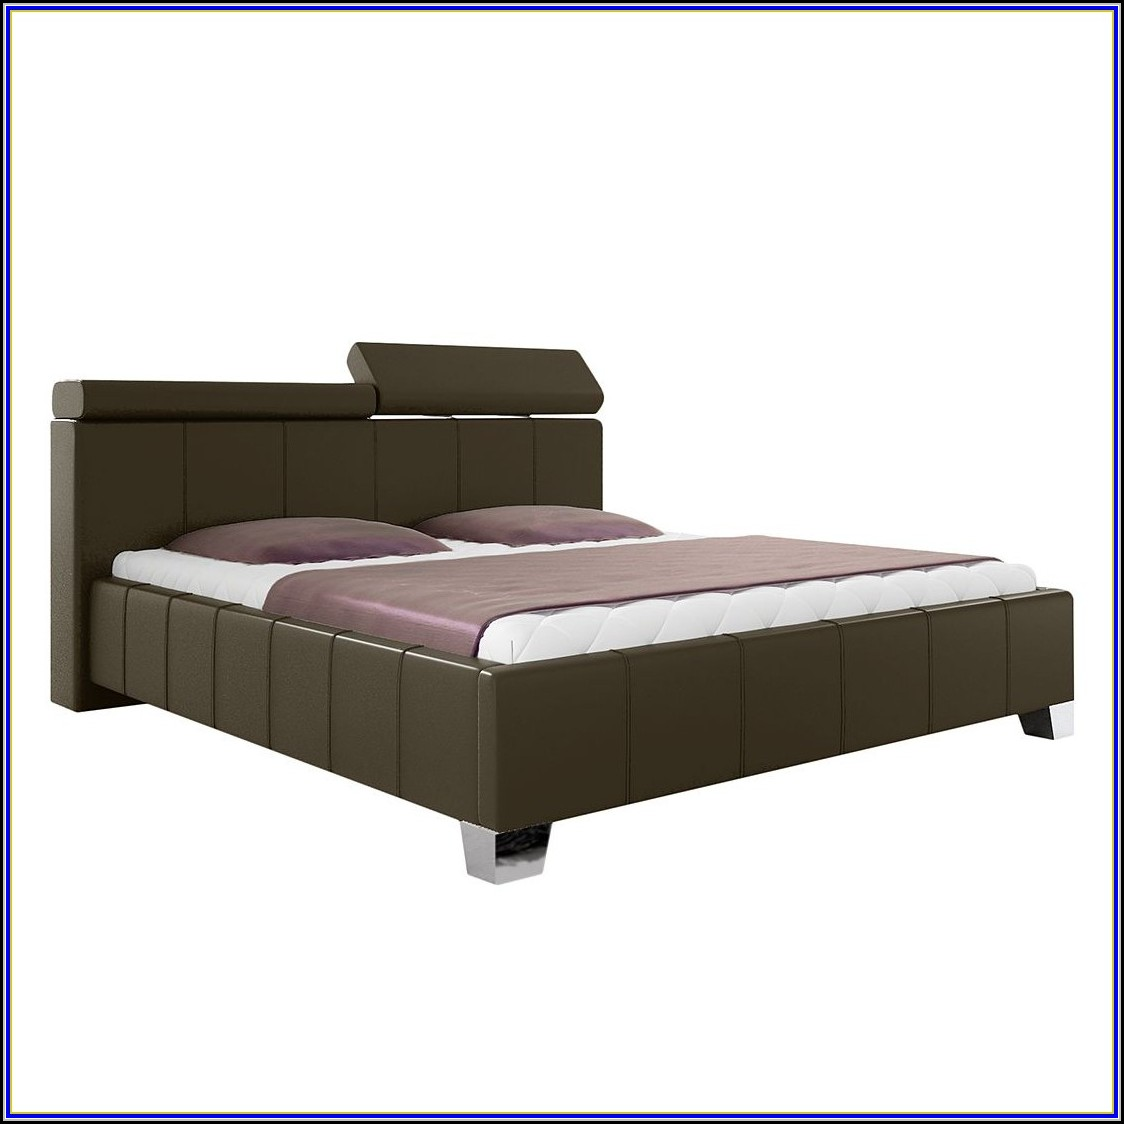 ikea bett breite 140 betten house und dekor galerie 5ek6y6drop. Black Bedroom Furniture Sets. Home Design Ideas